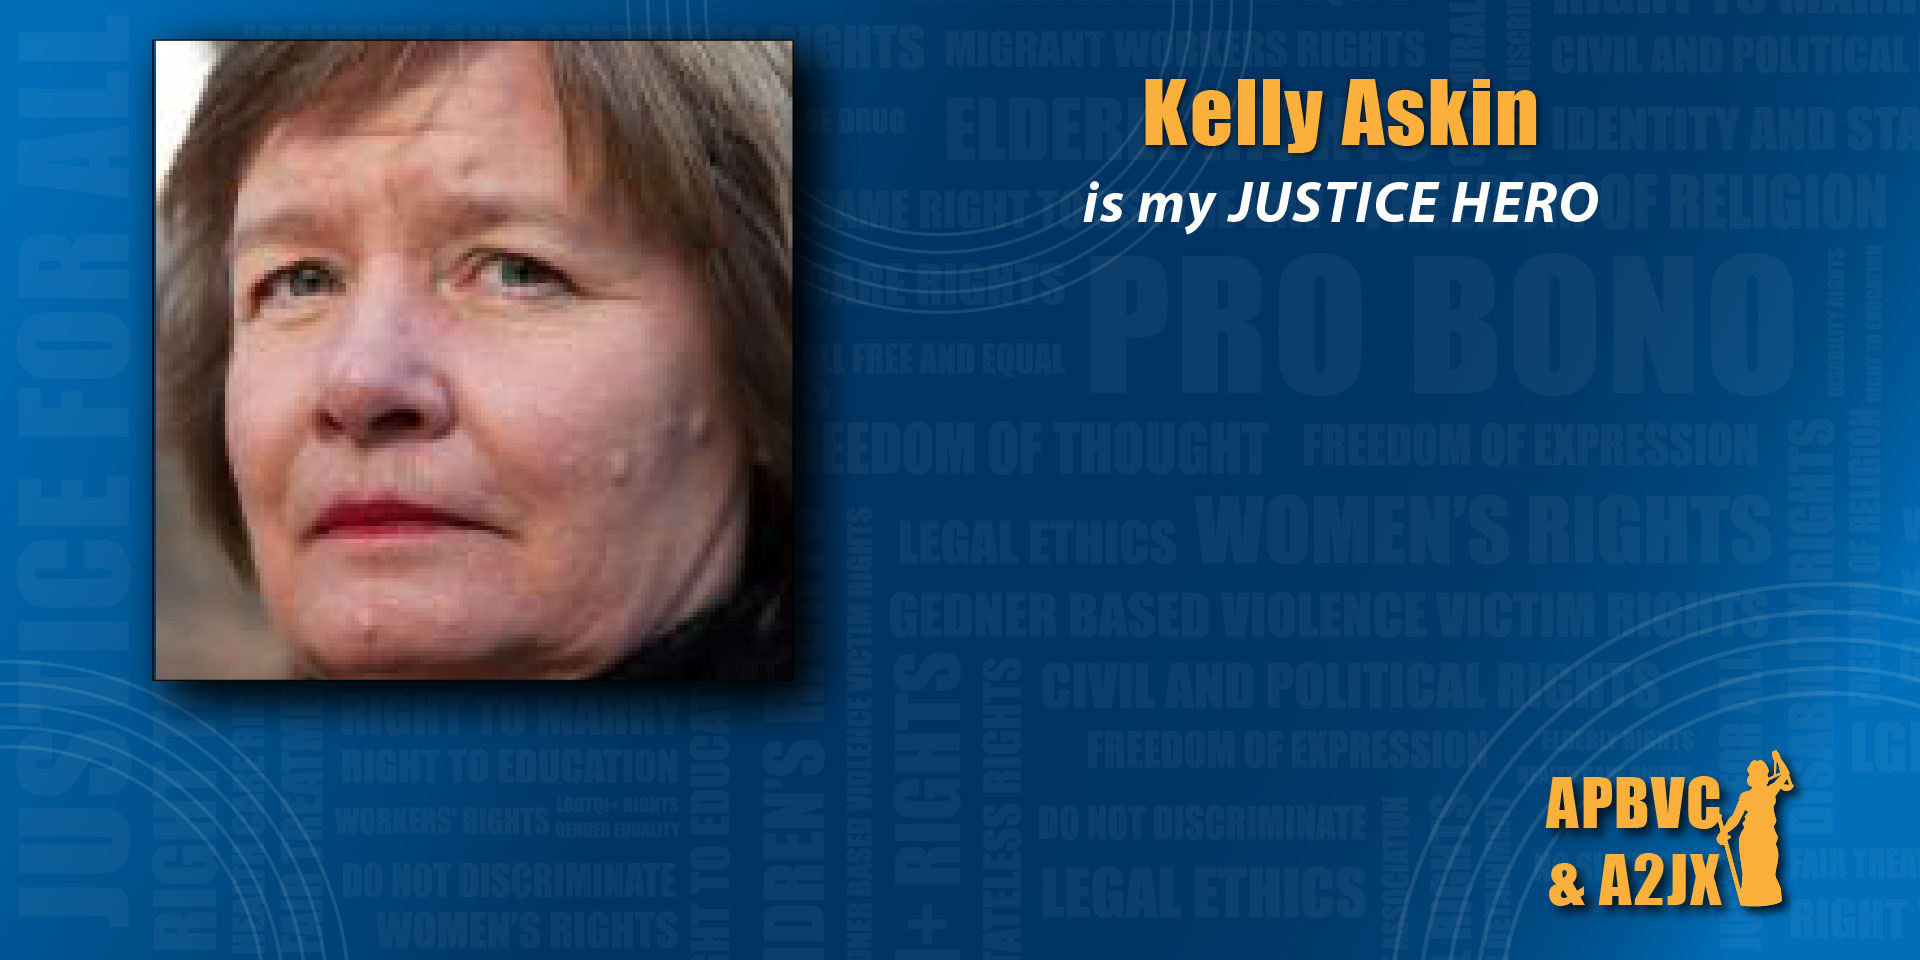 Kelly Askin